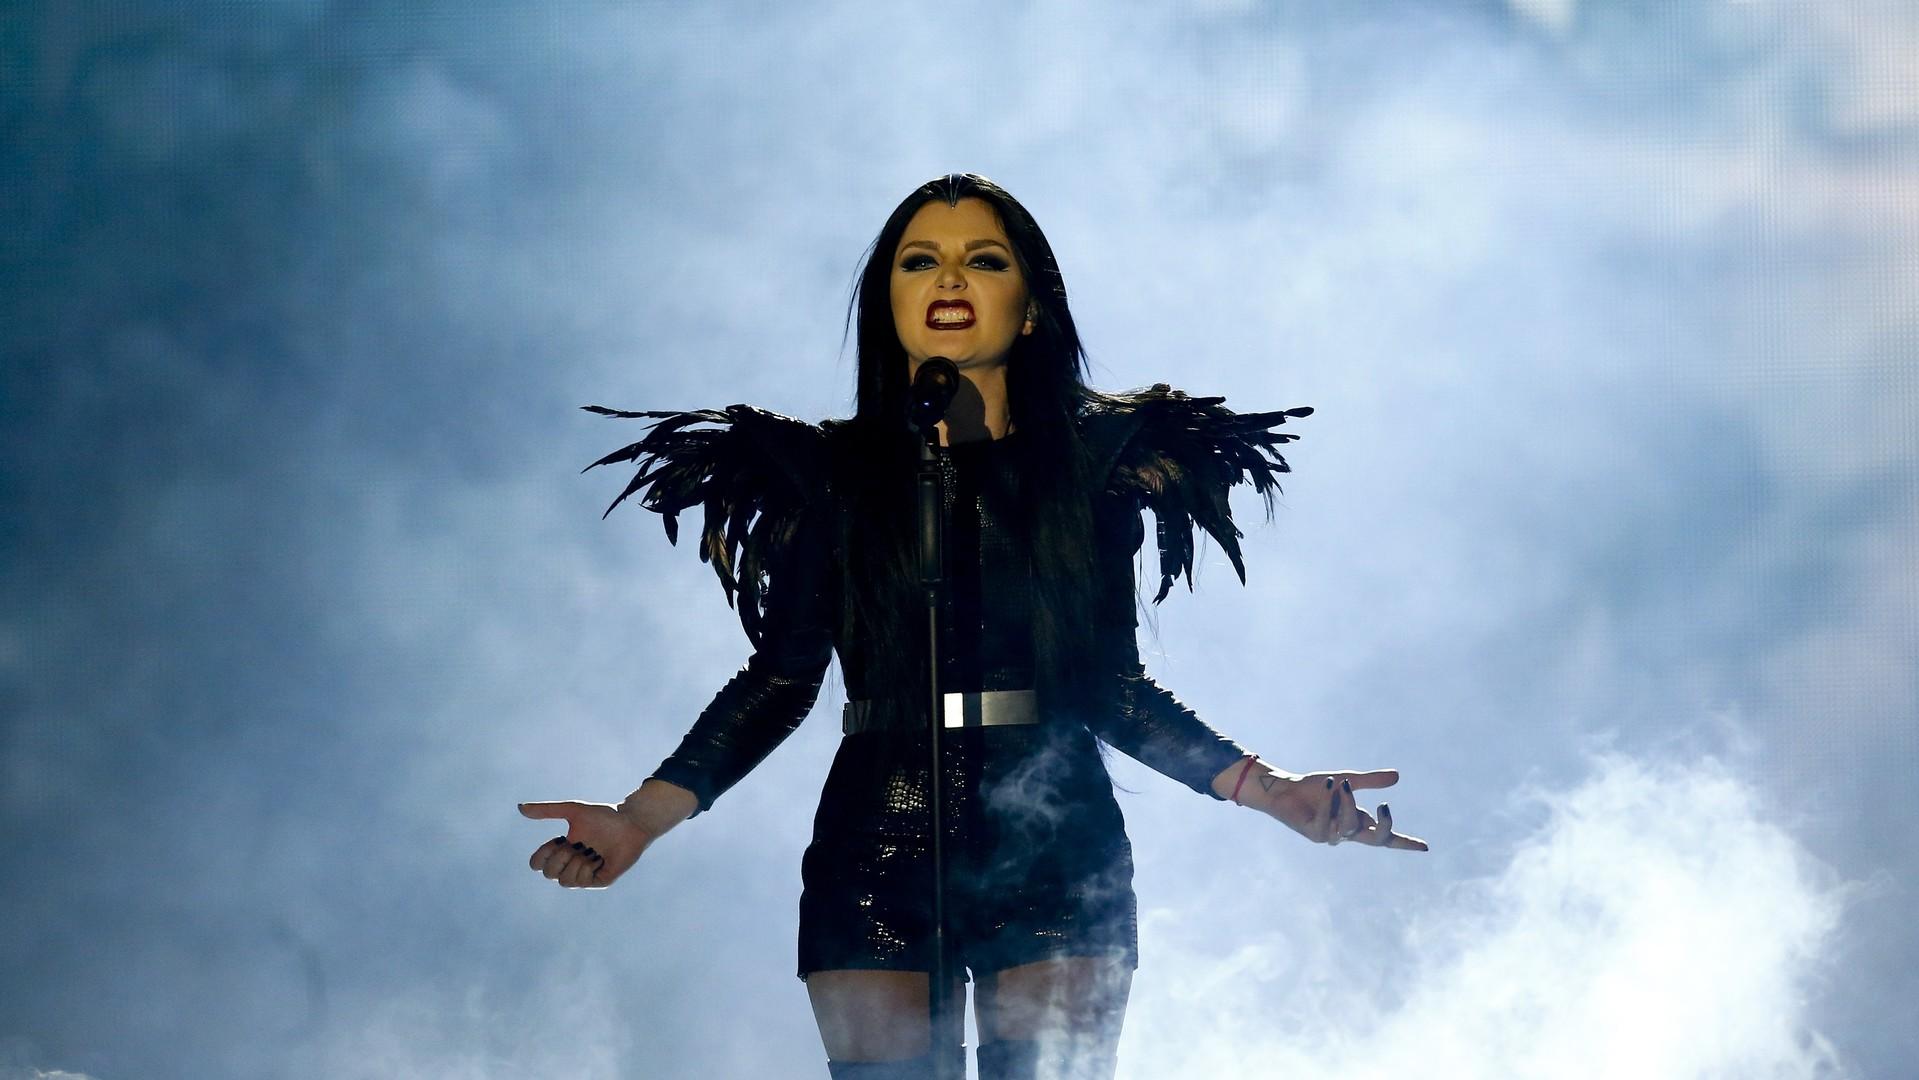 La chanteuse moldave Nina Sublatti